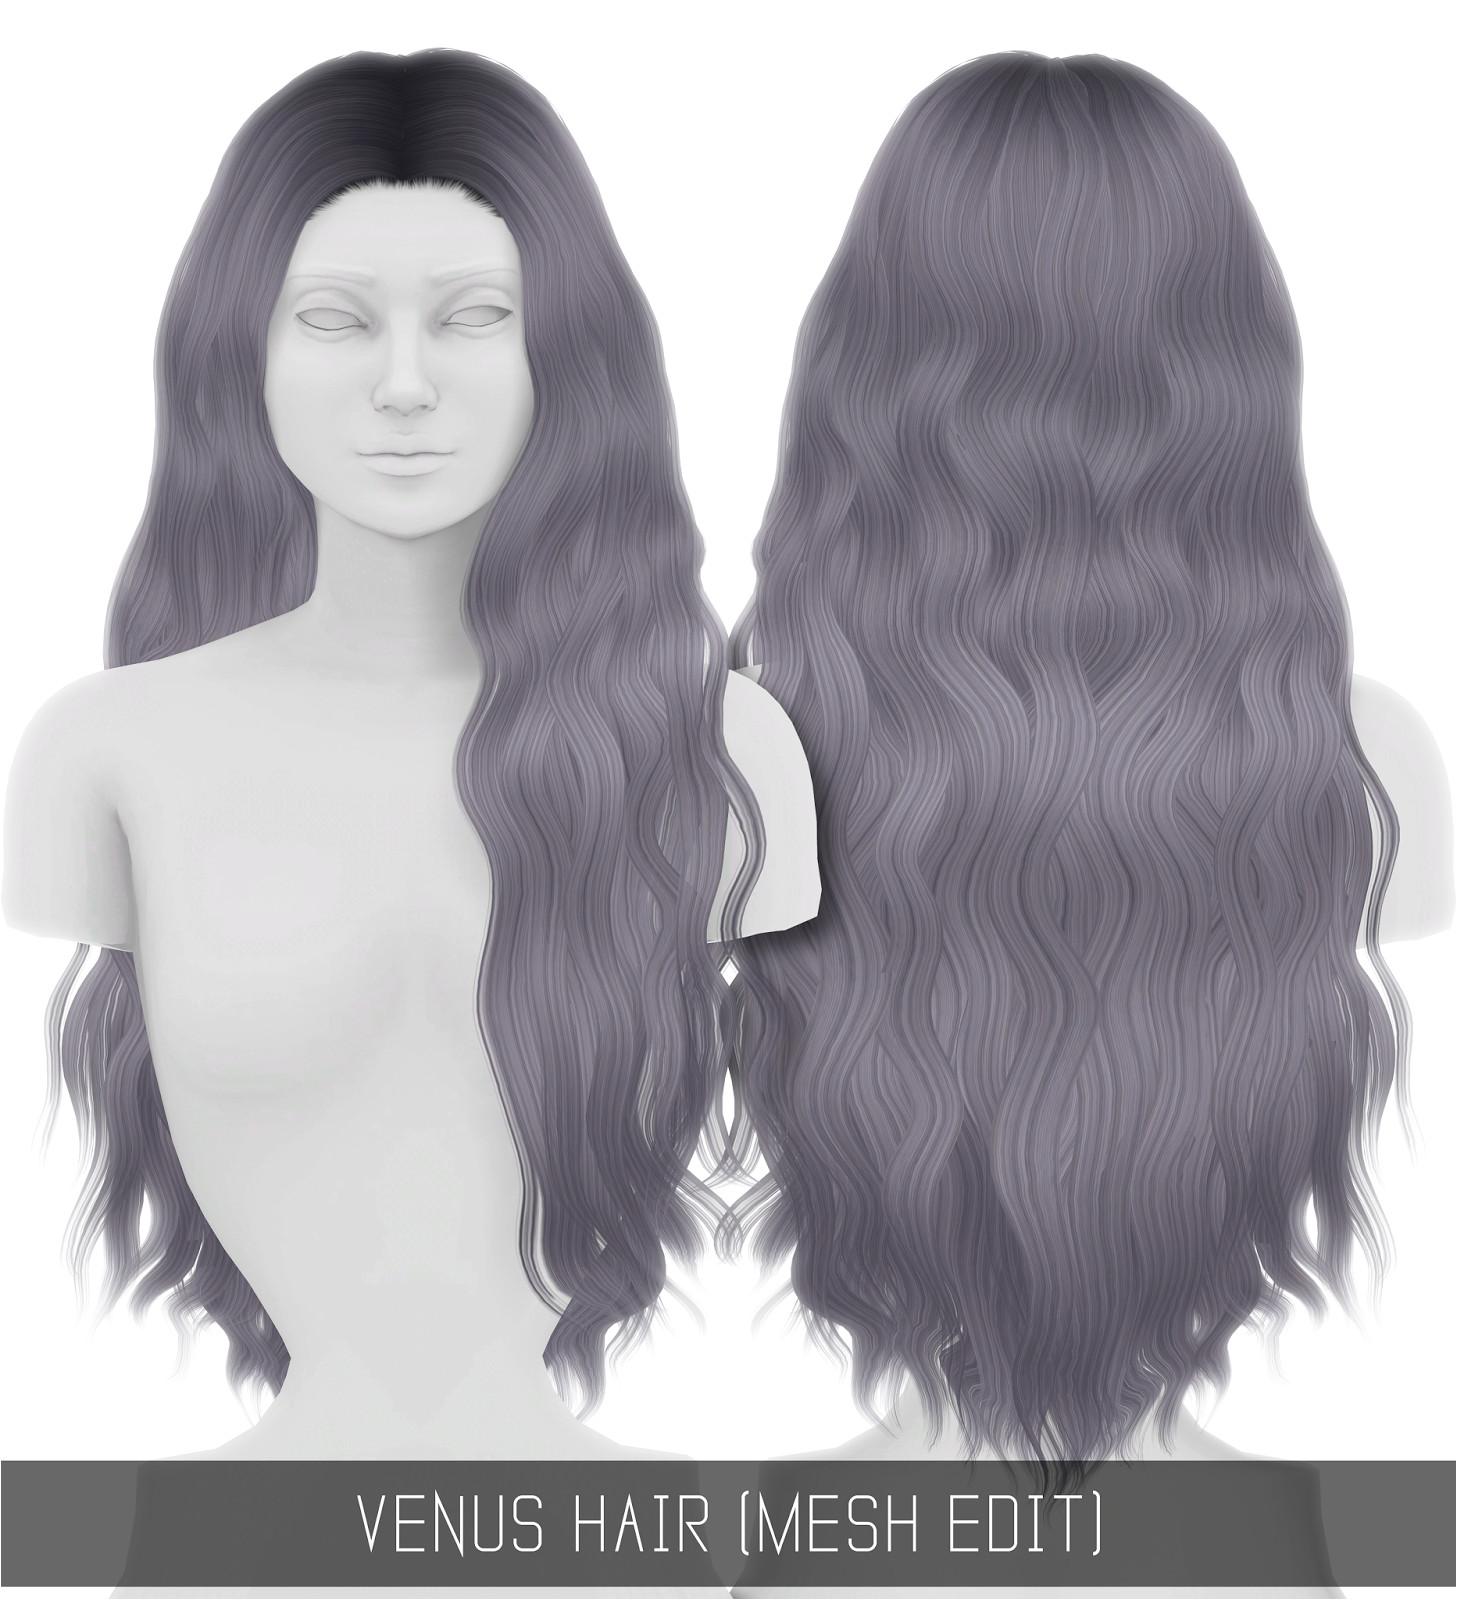 Venus Hair Mesh Edit Simpliciaty